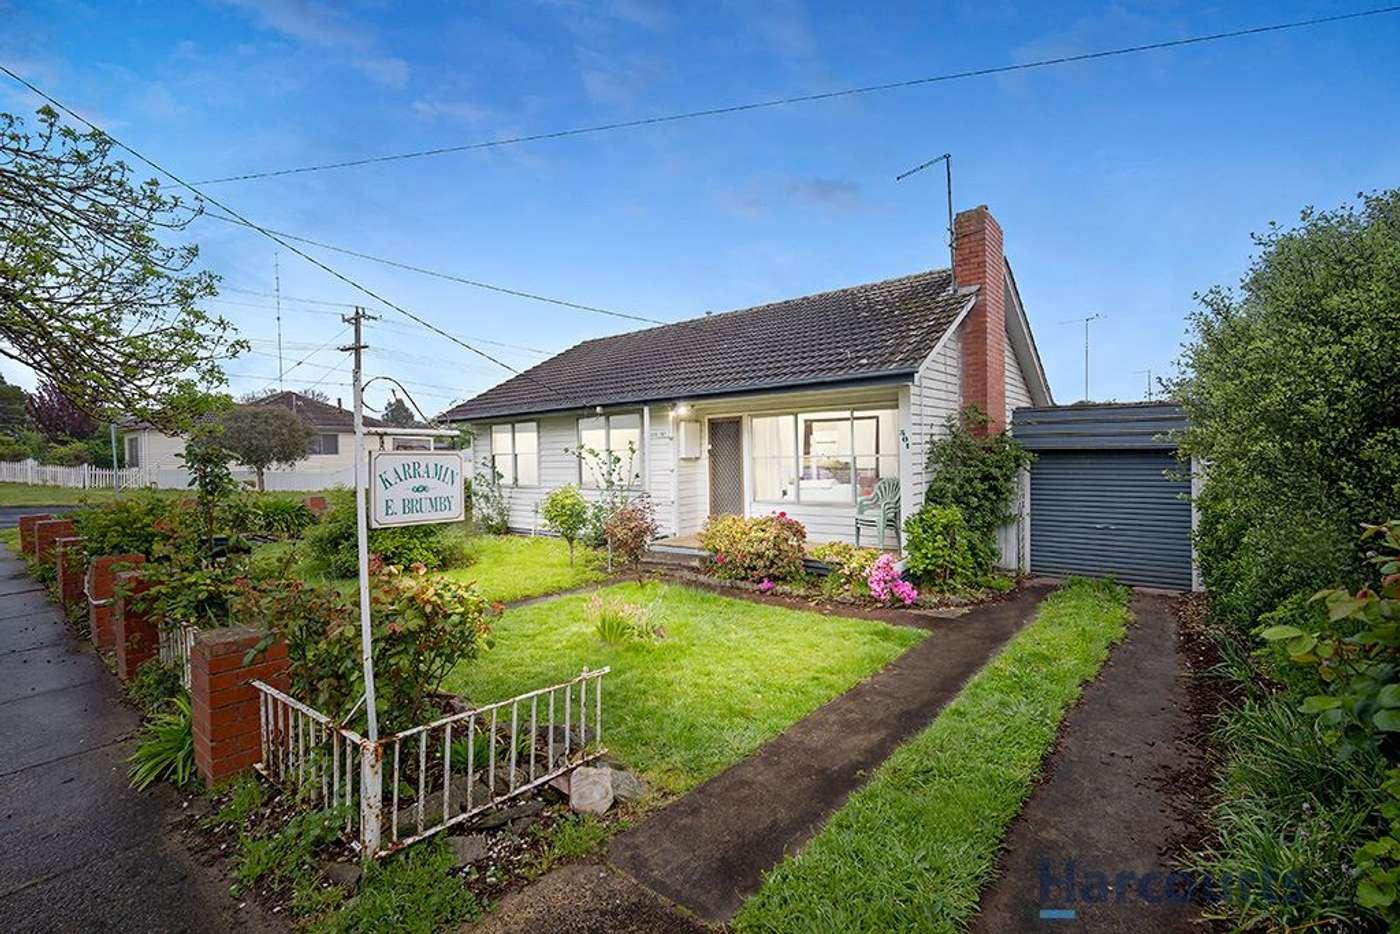 Main view of Homely house listing, 501 York Street, Ballarat East VIC 3350